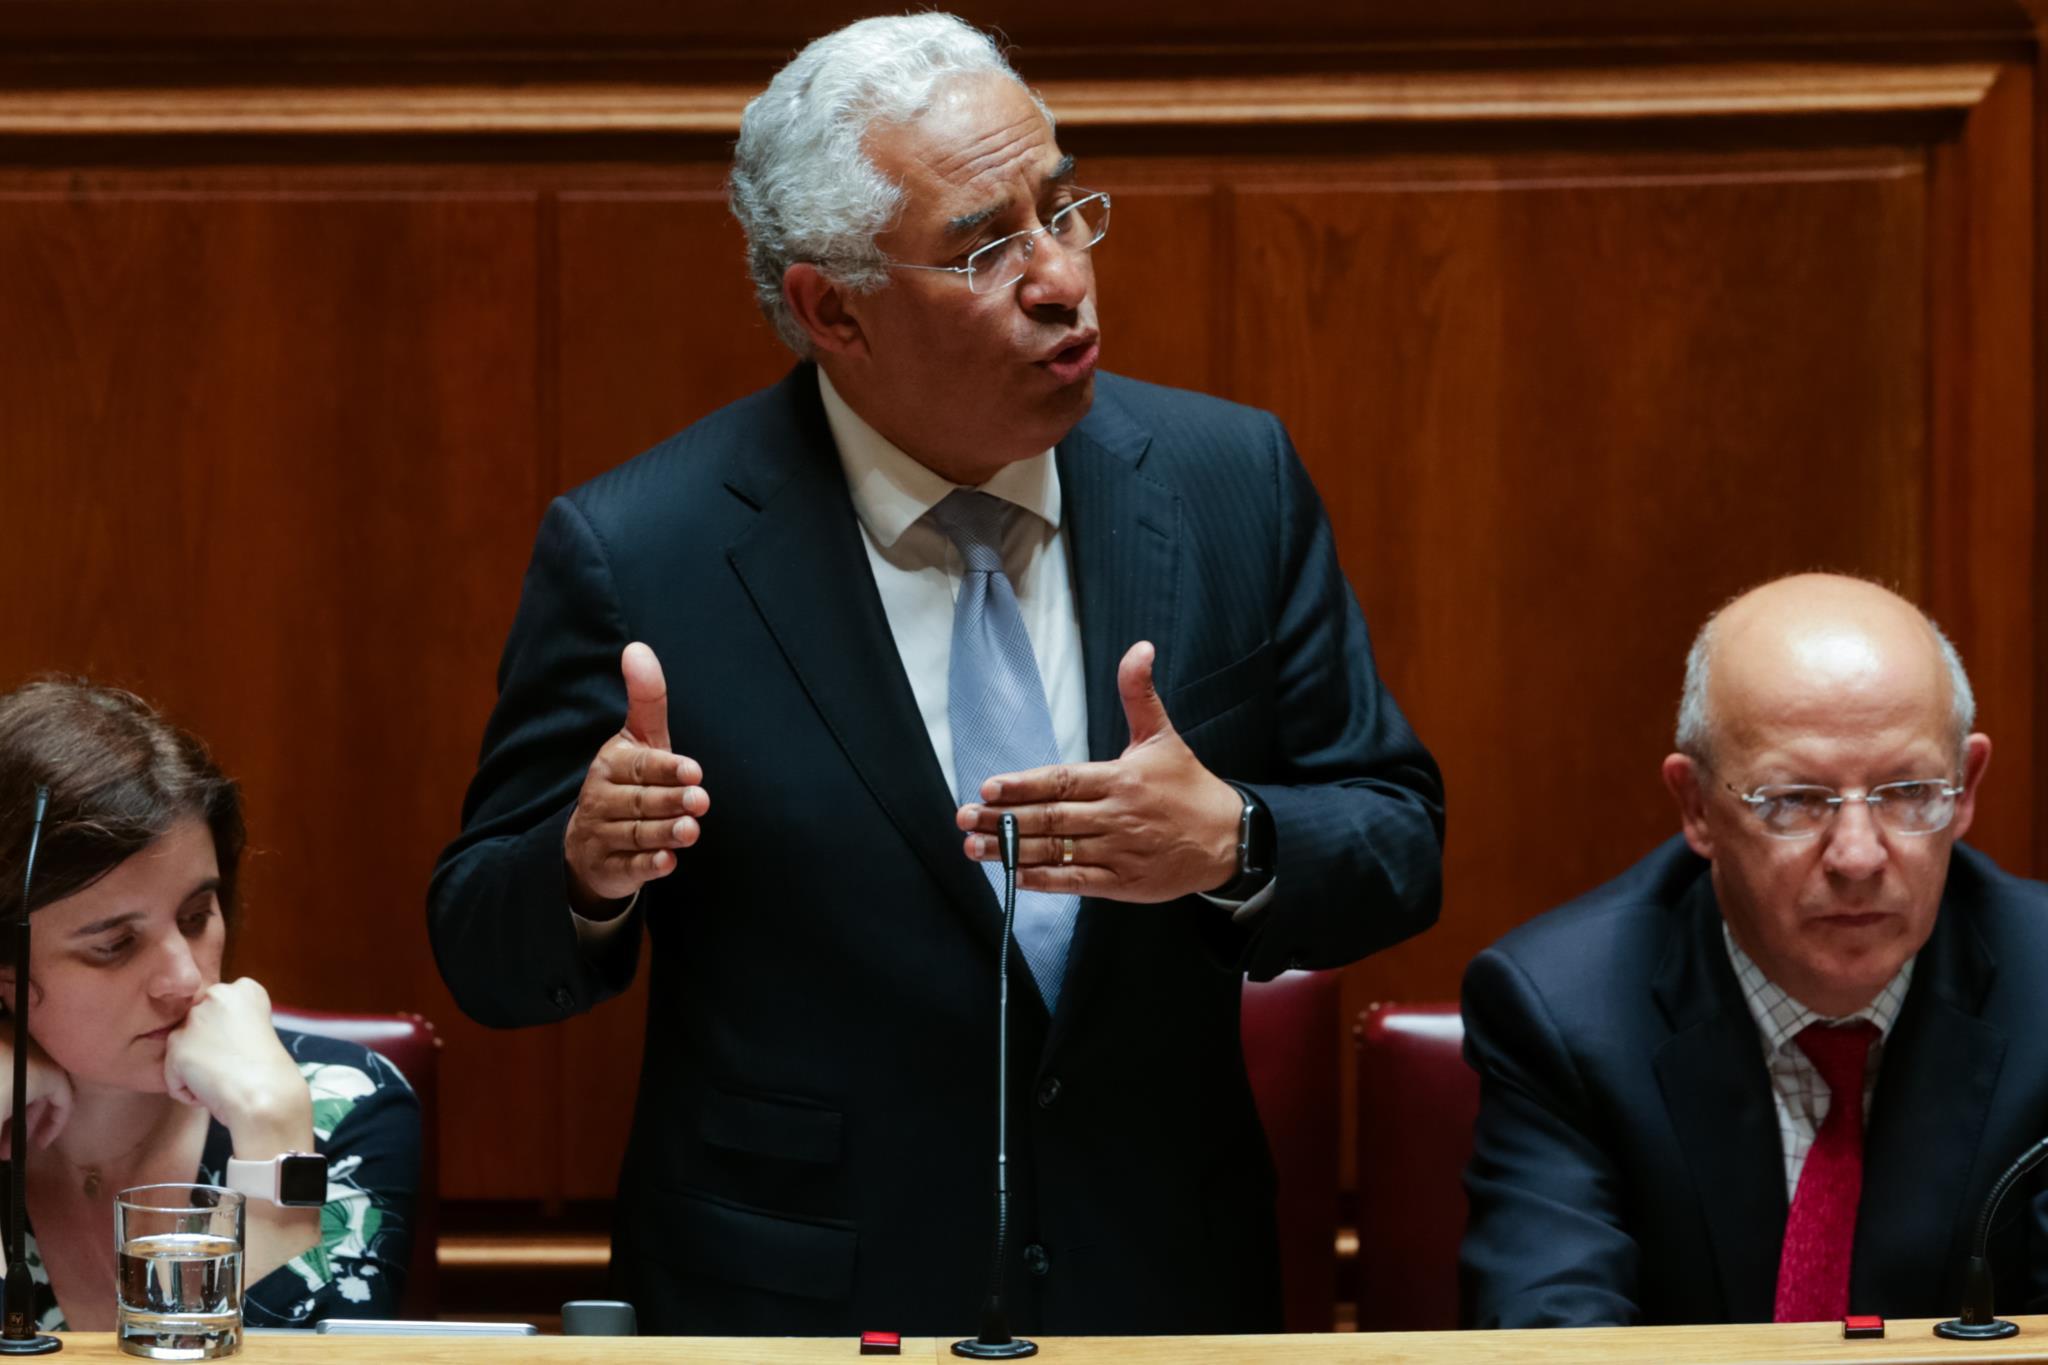 PÚBLICO - Costa acredita no crescimento, na conjuntura e na mudança da Europa